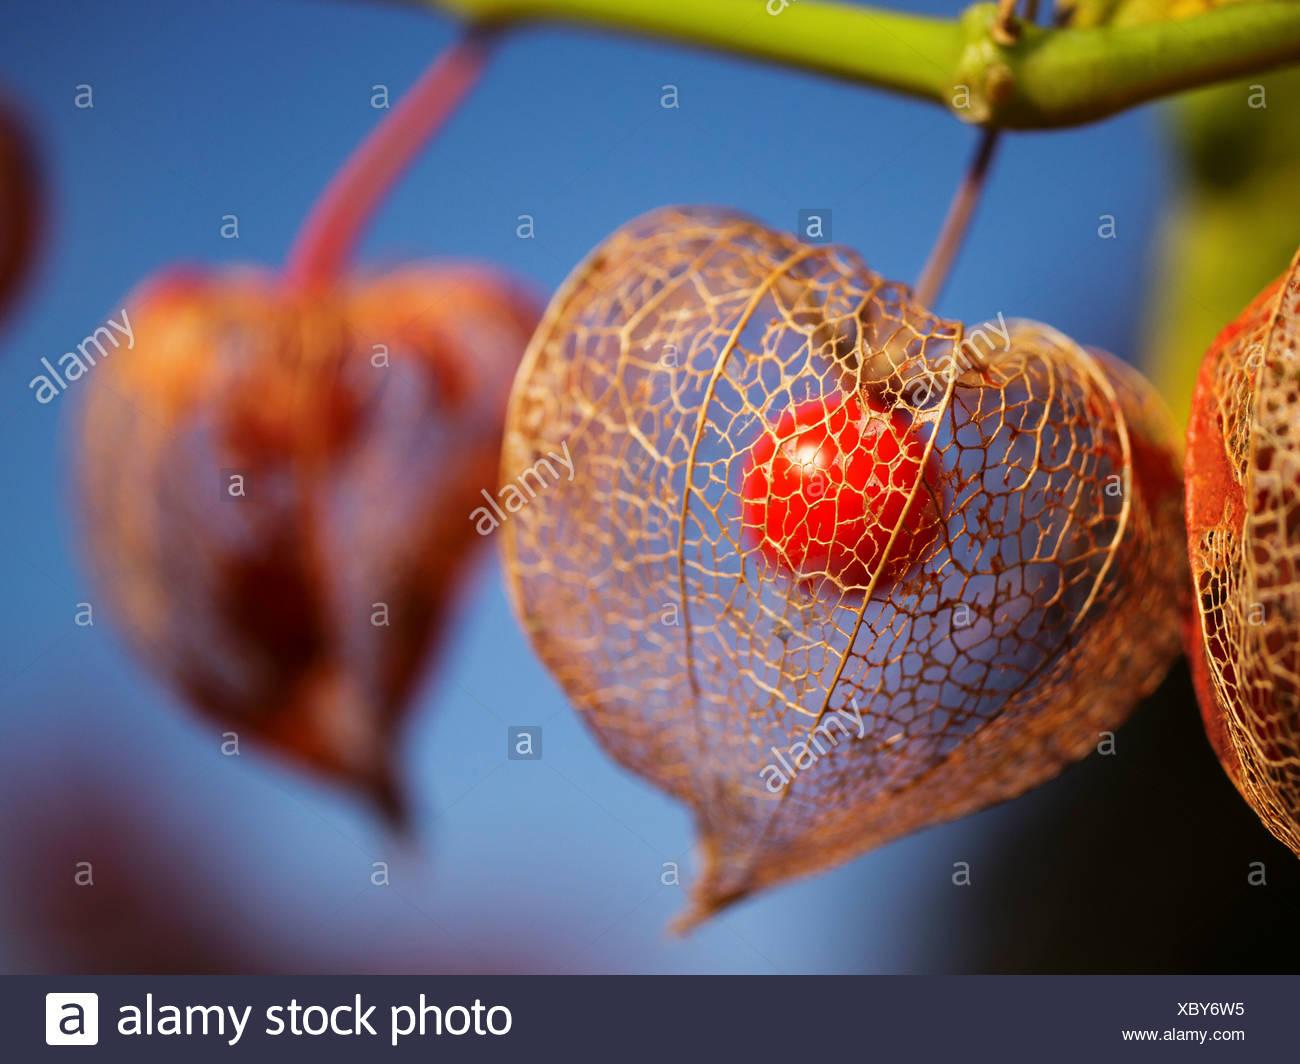 berry, vein, leaf-vein, nervure, autumn, fall, groundcherry, ground cherry, ground cherry, lampion, Chinese lantern, nightshade - Stock Image